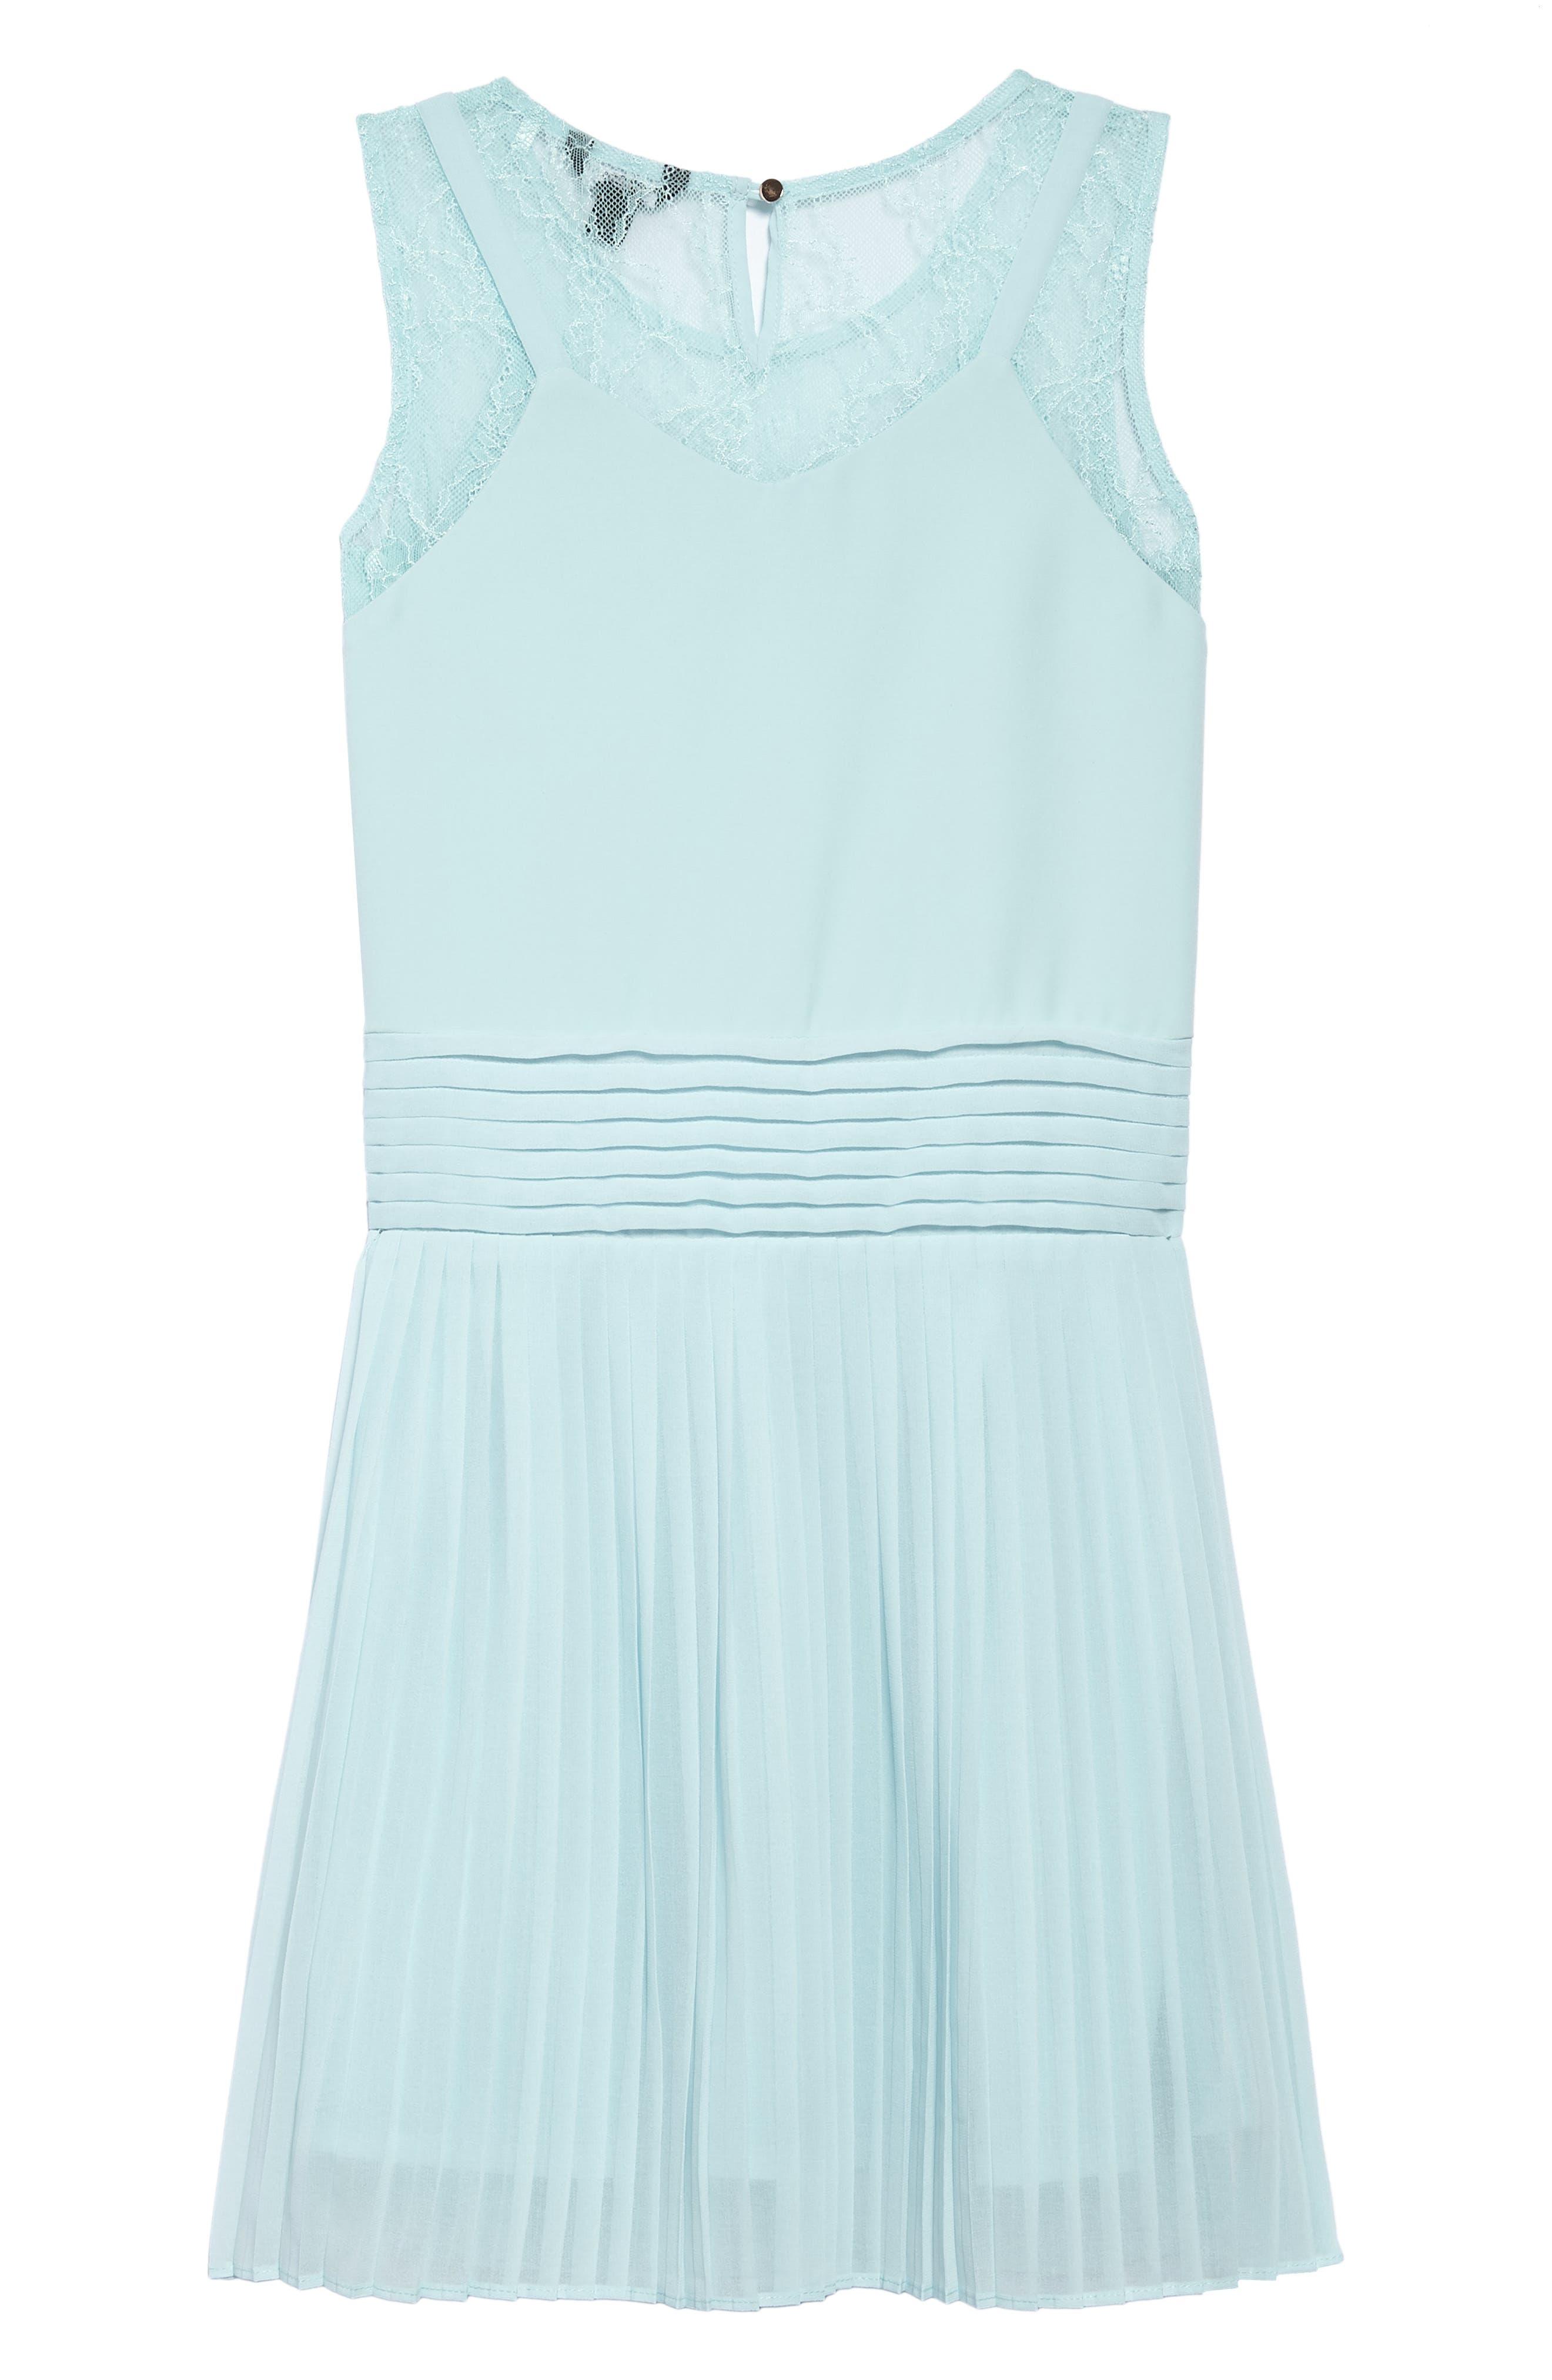 Pleated Chiffon Party Dress,                             Alternate thumbnail 2, color,                             Beau Blue